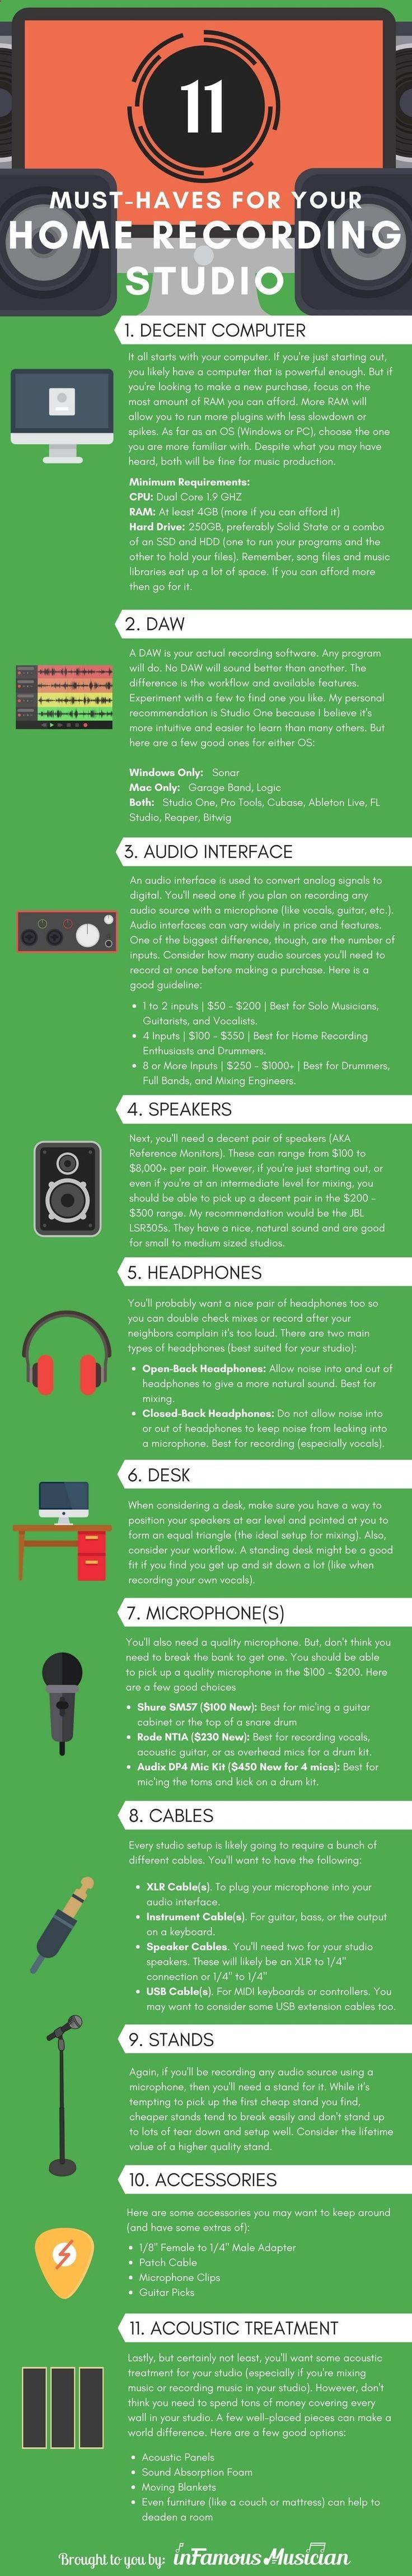 Home Recording Studio Equipment [Infographic] www.infamousmusic... #homerecording #homestudio